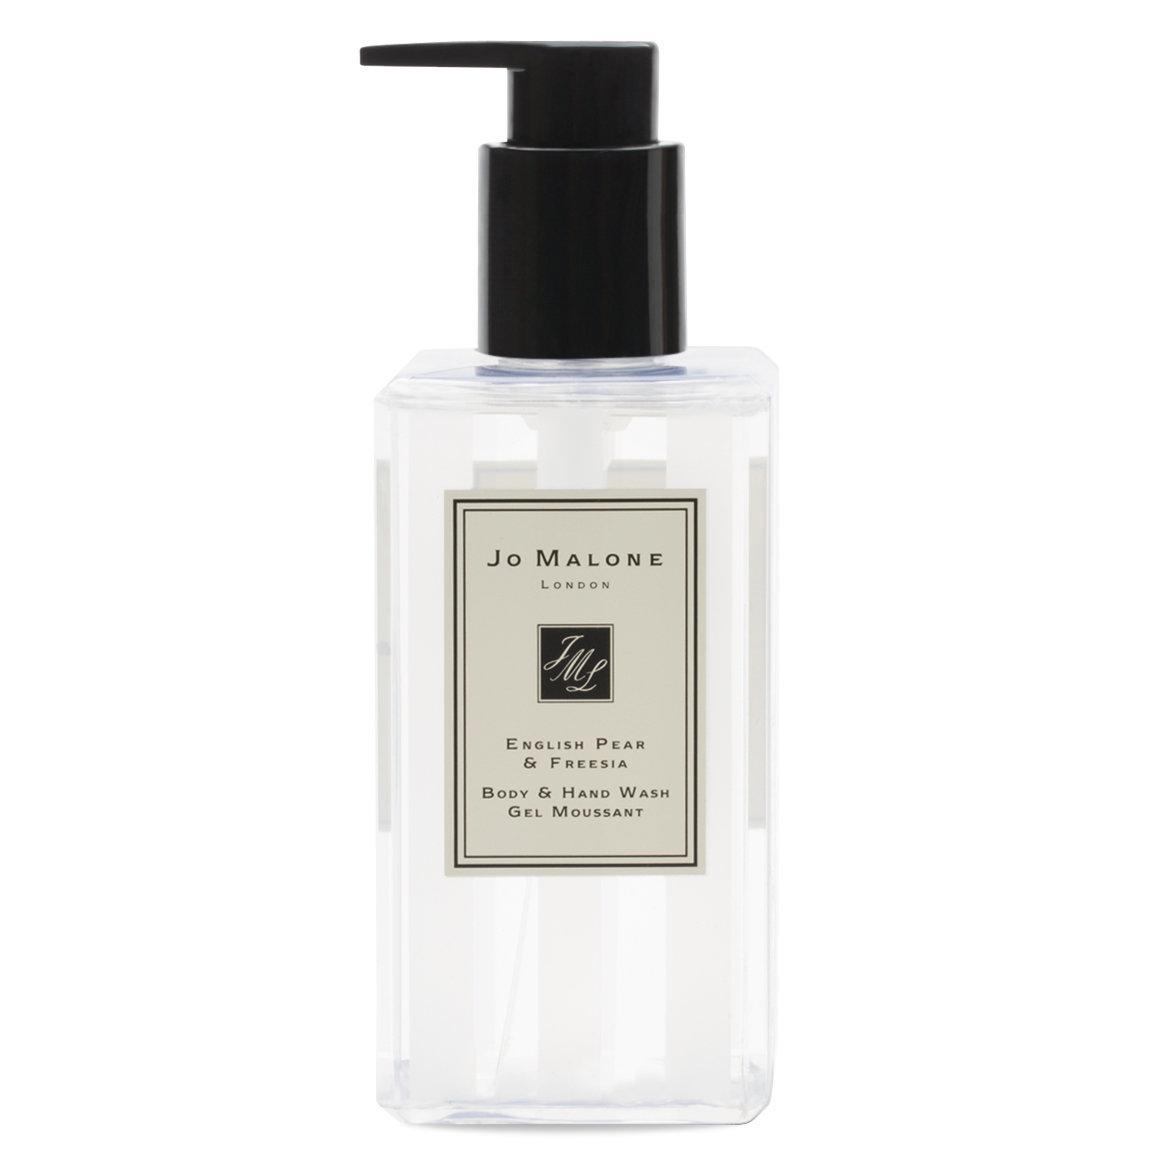 Jo Malone London English Pear & Freesia Body & Hand Wash product swatch.